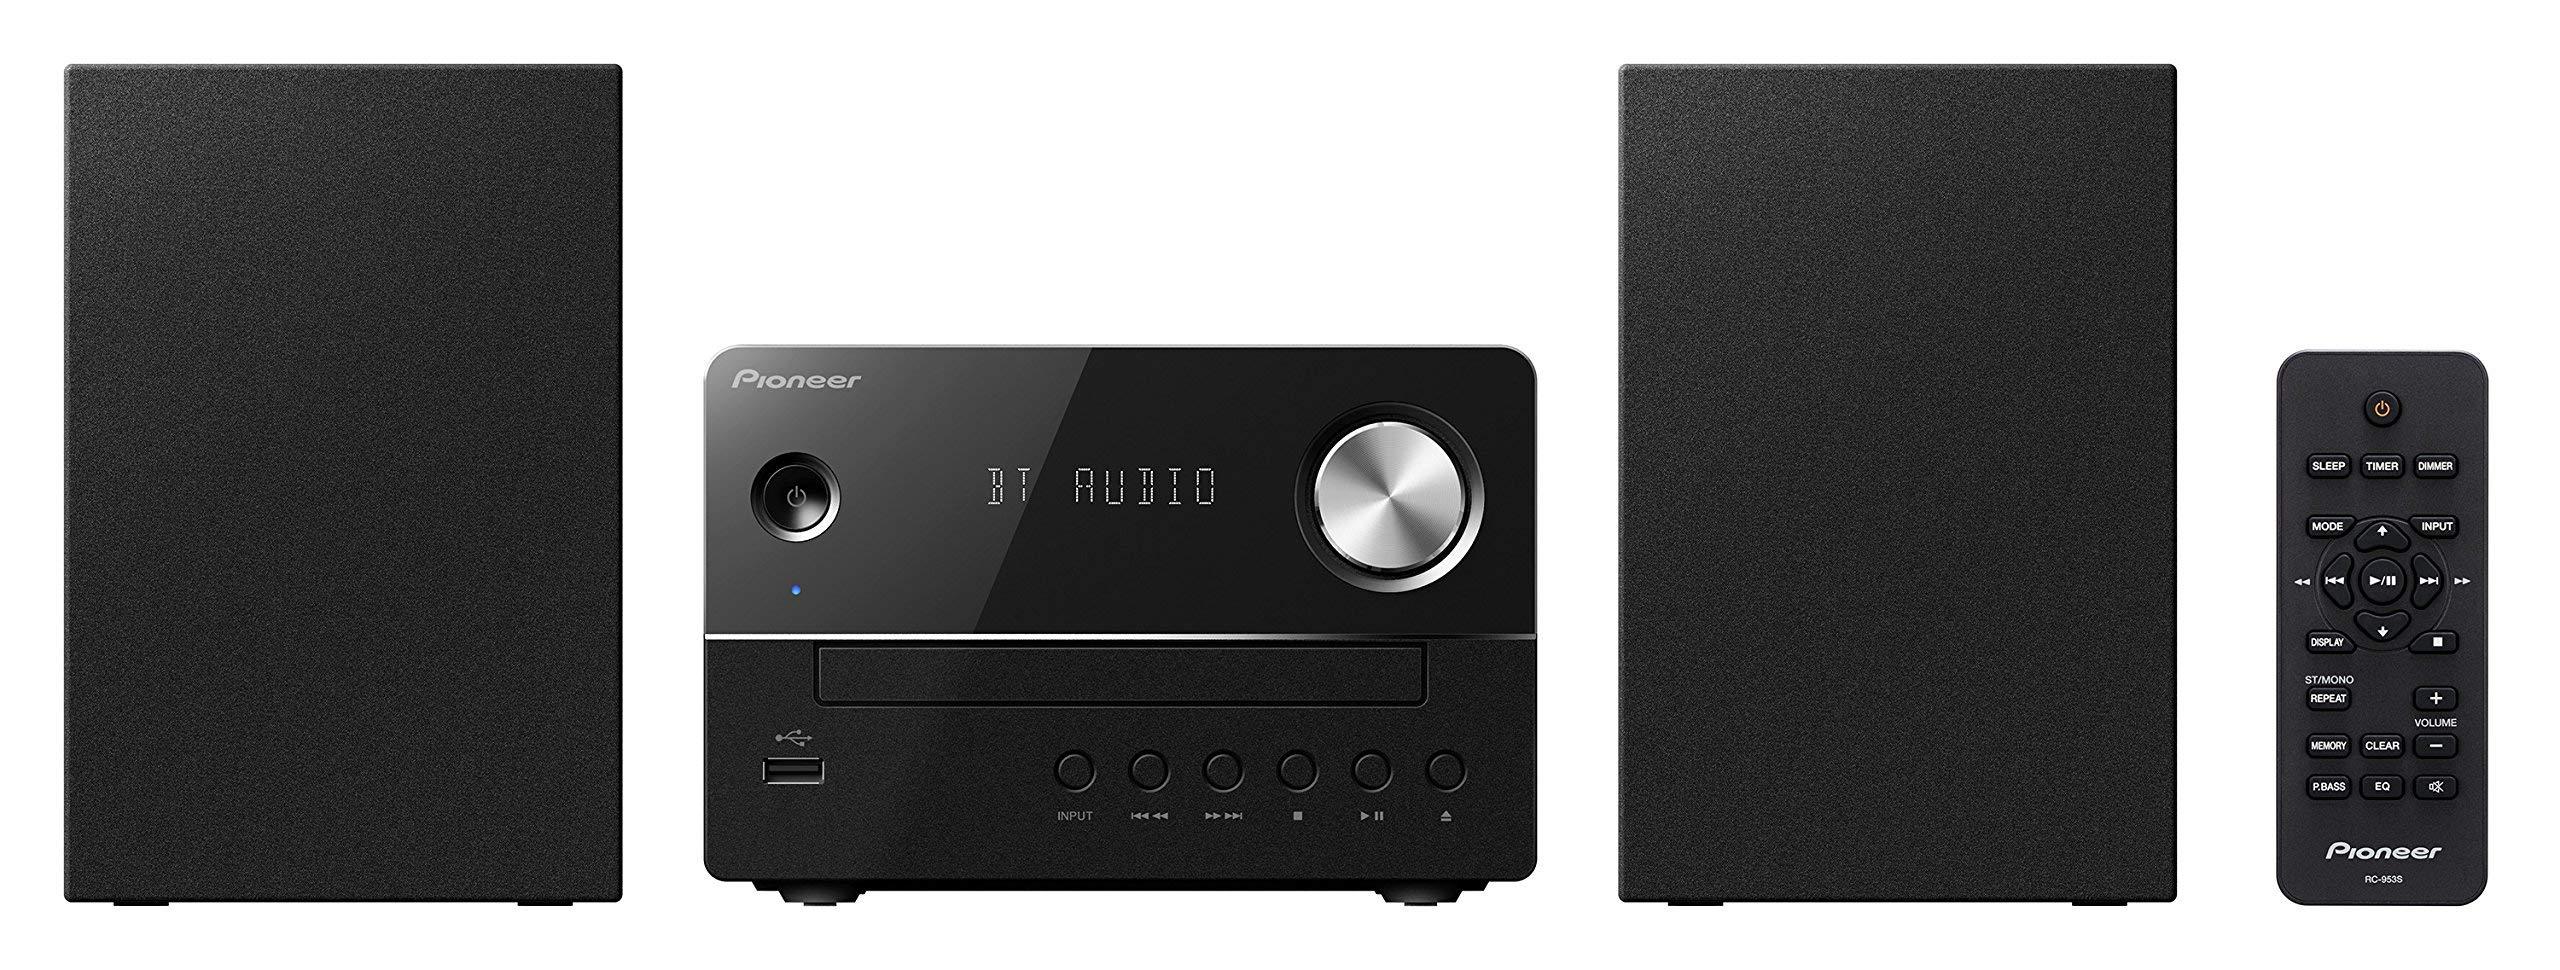 Pioneer - 10W Main Unit and Speaker System Combo Set - Black - X-EM26 (Renewed)